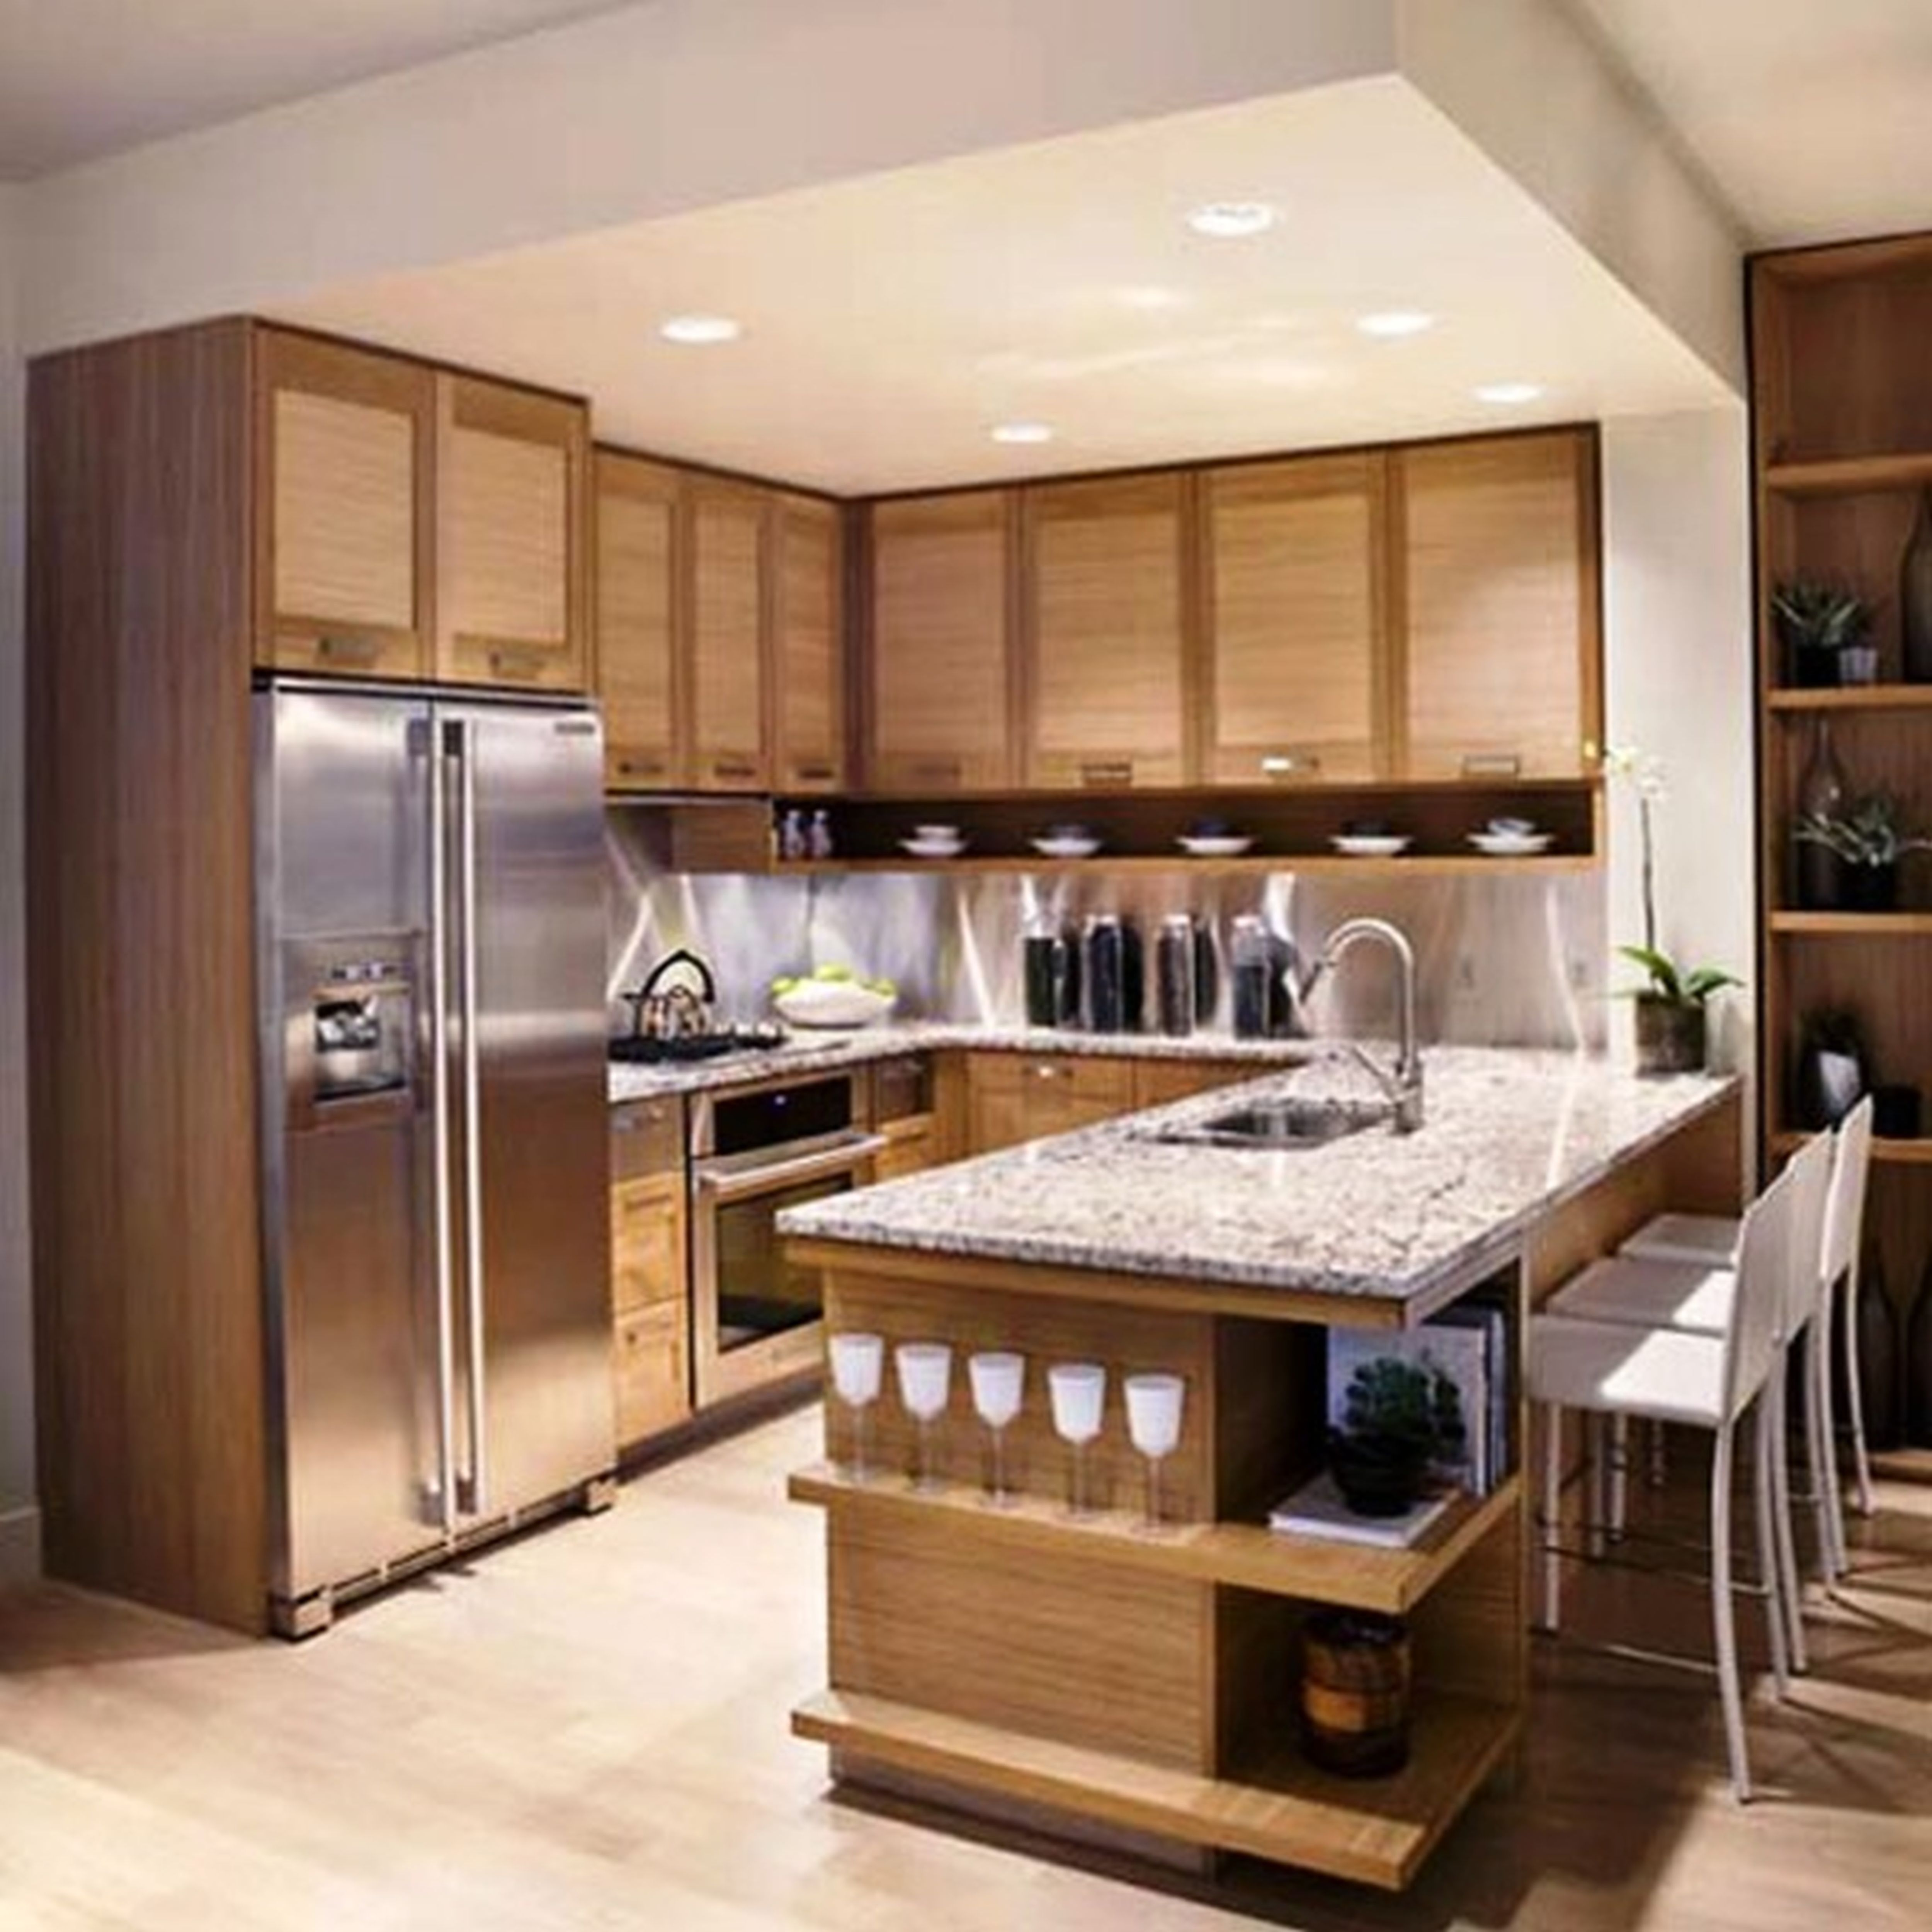 Home decor kitchen ideas design inspiration amazing